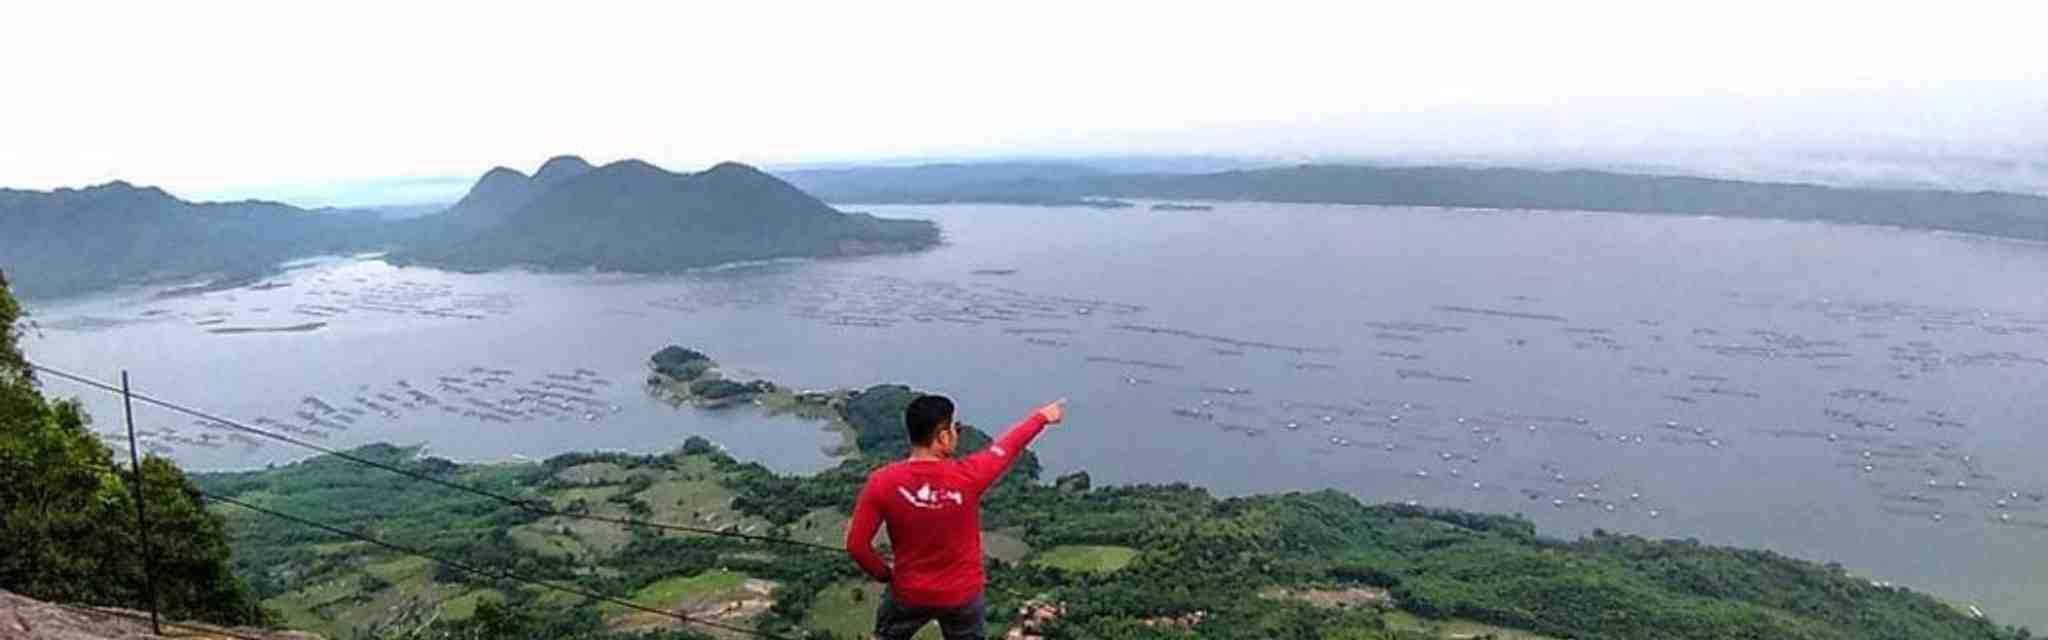 Gunung Lembu Spot Menikmati Pemandangan Alam Purwakarta